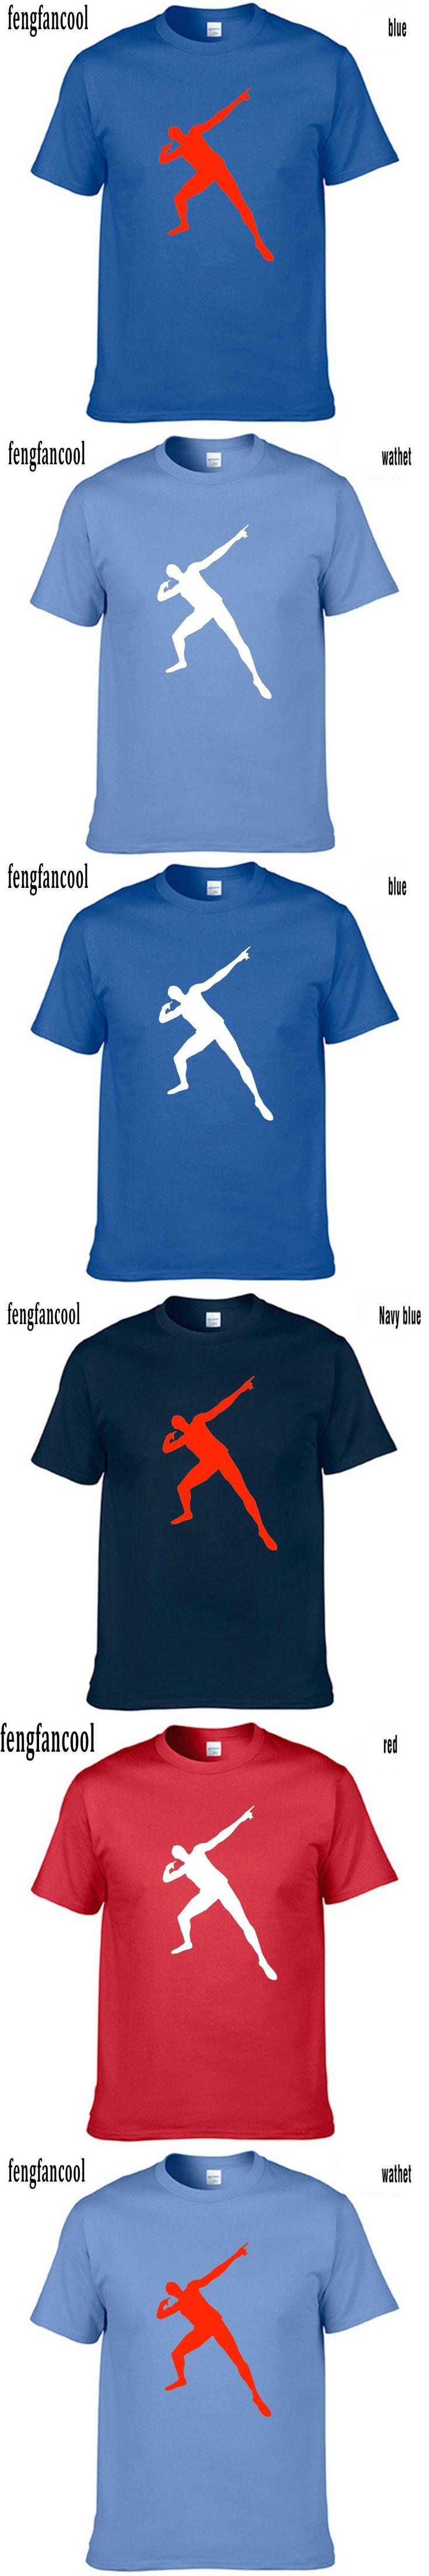 fengfancool brand Women Men Usain Bolt T Shirt Men Short Sleeve Cotton Casual T-Shirt Hip Hop men fashion tops